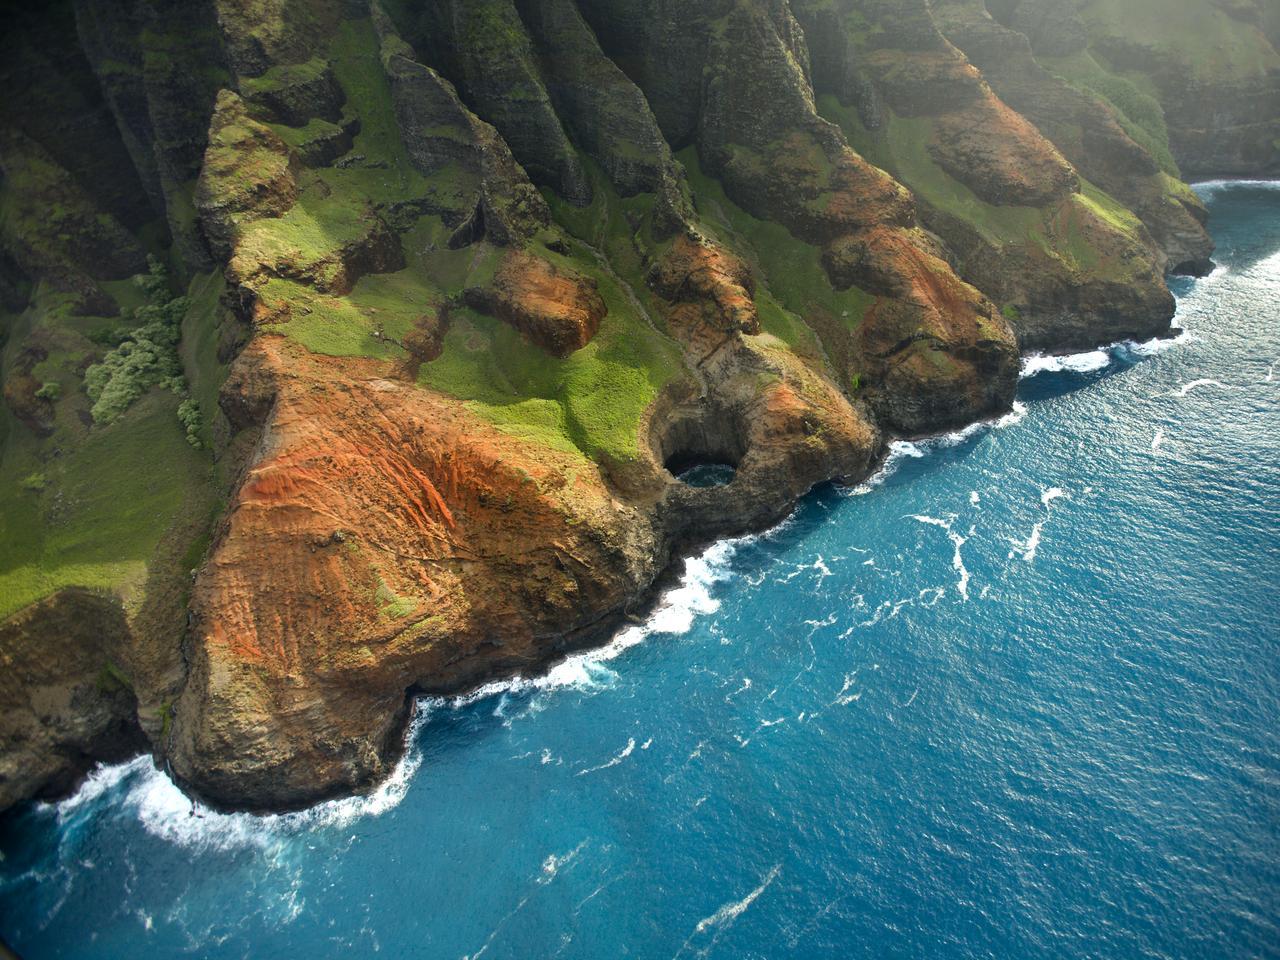 Otherworldly landscape of Hawaii's Na Pali Coastline on the island of Kauai.